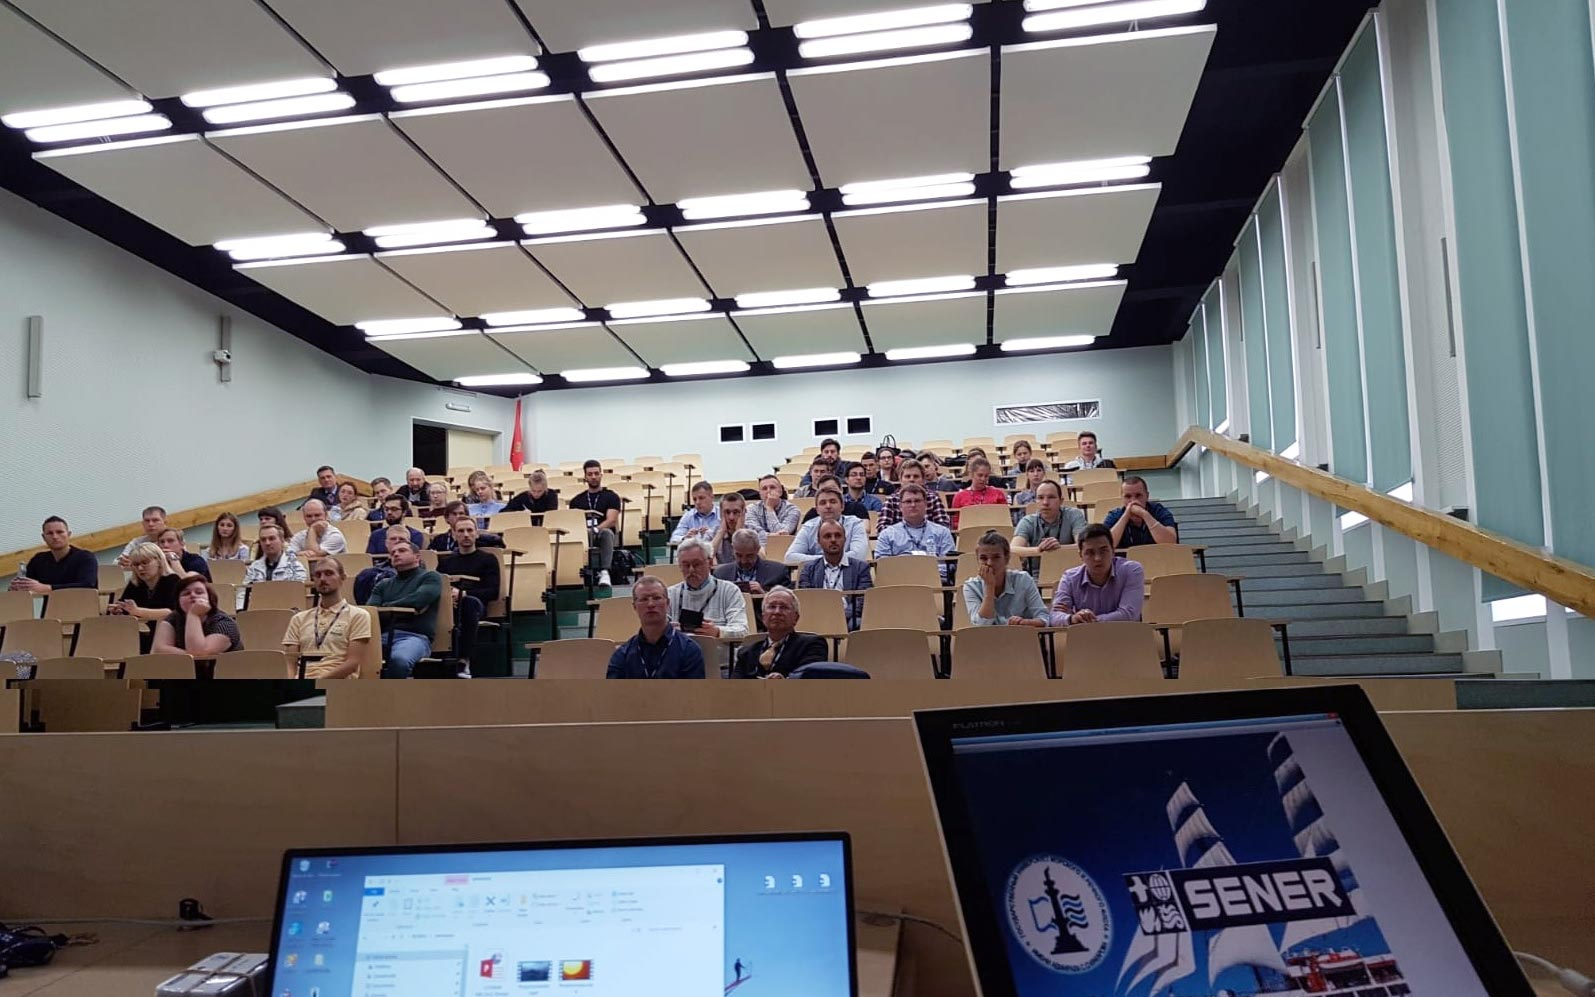 http://www.ingenieriayconstruccion.sener/ecm-images/seminario-universidad-admiral-makarov